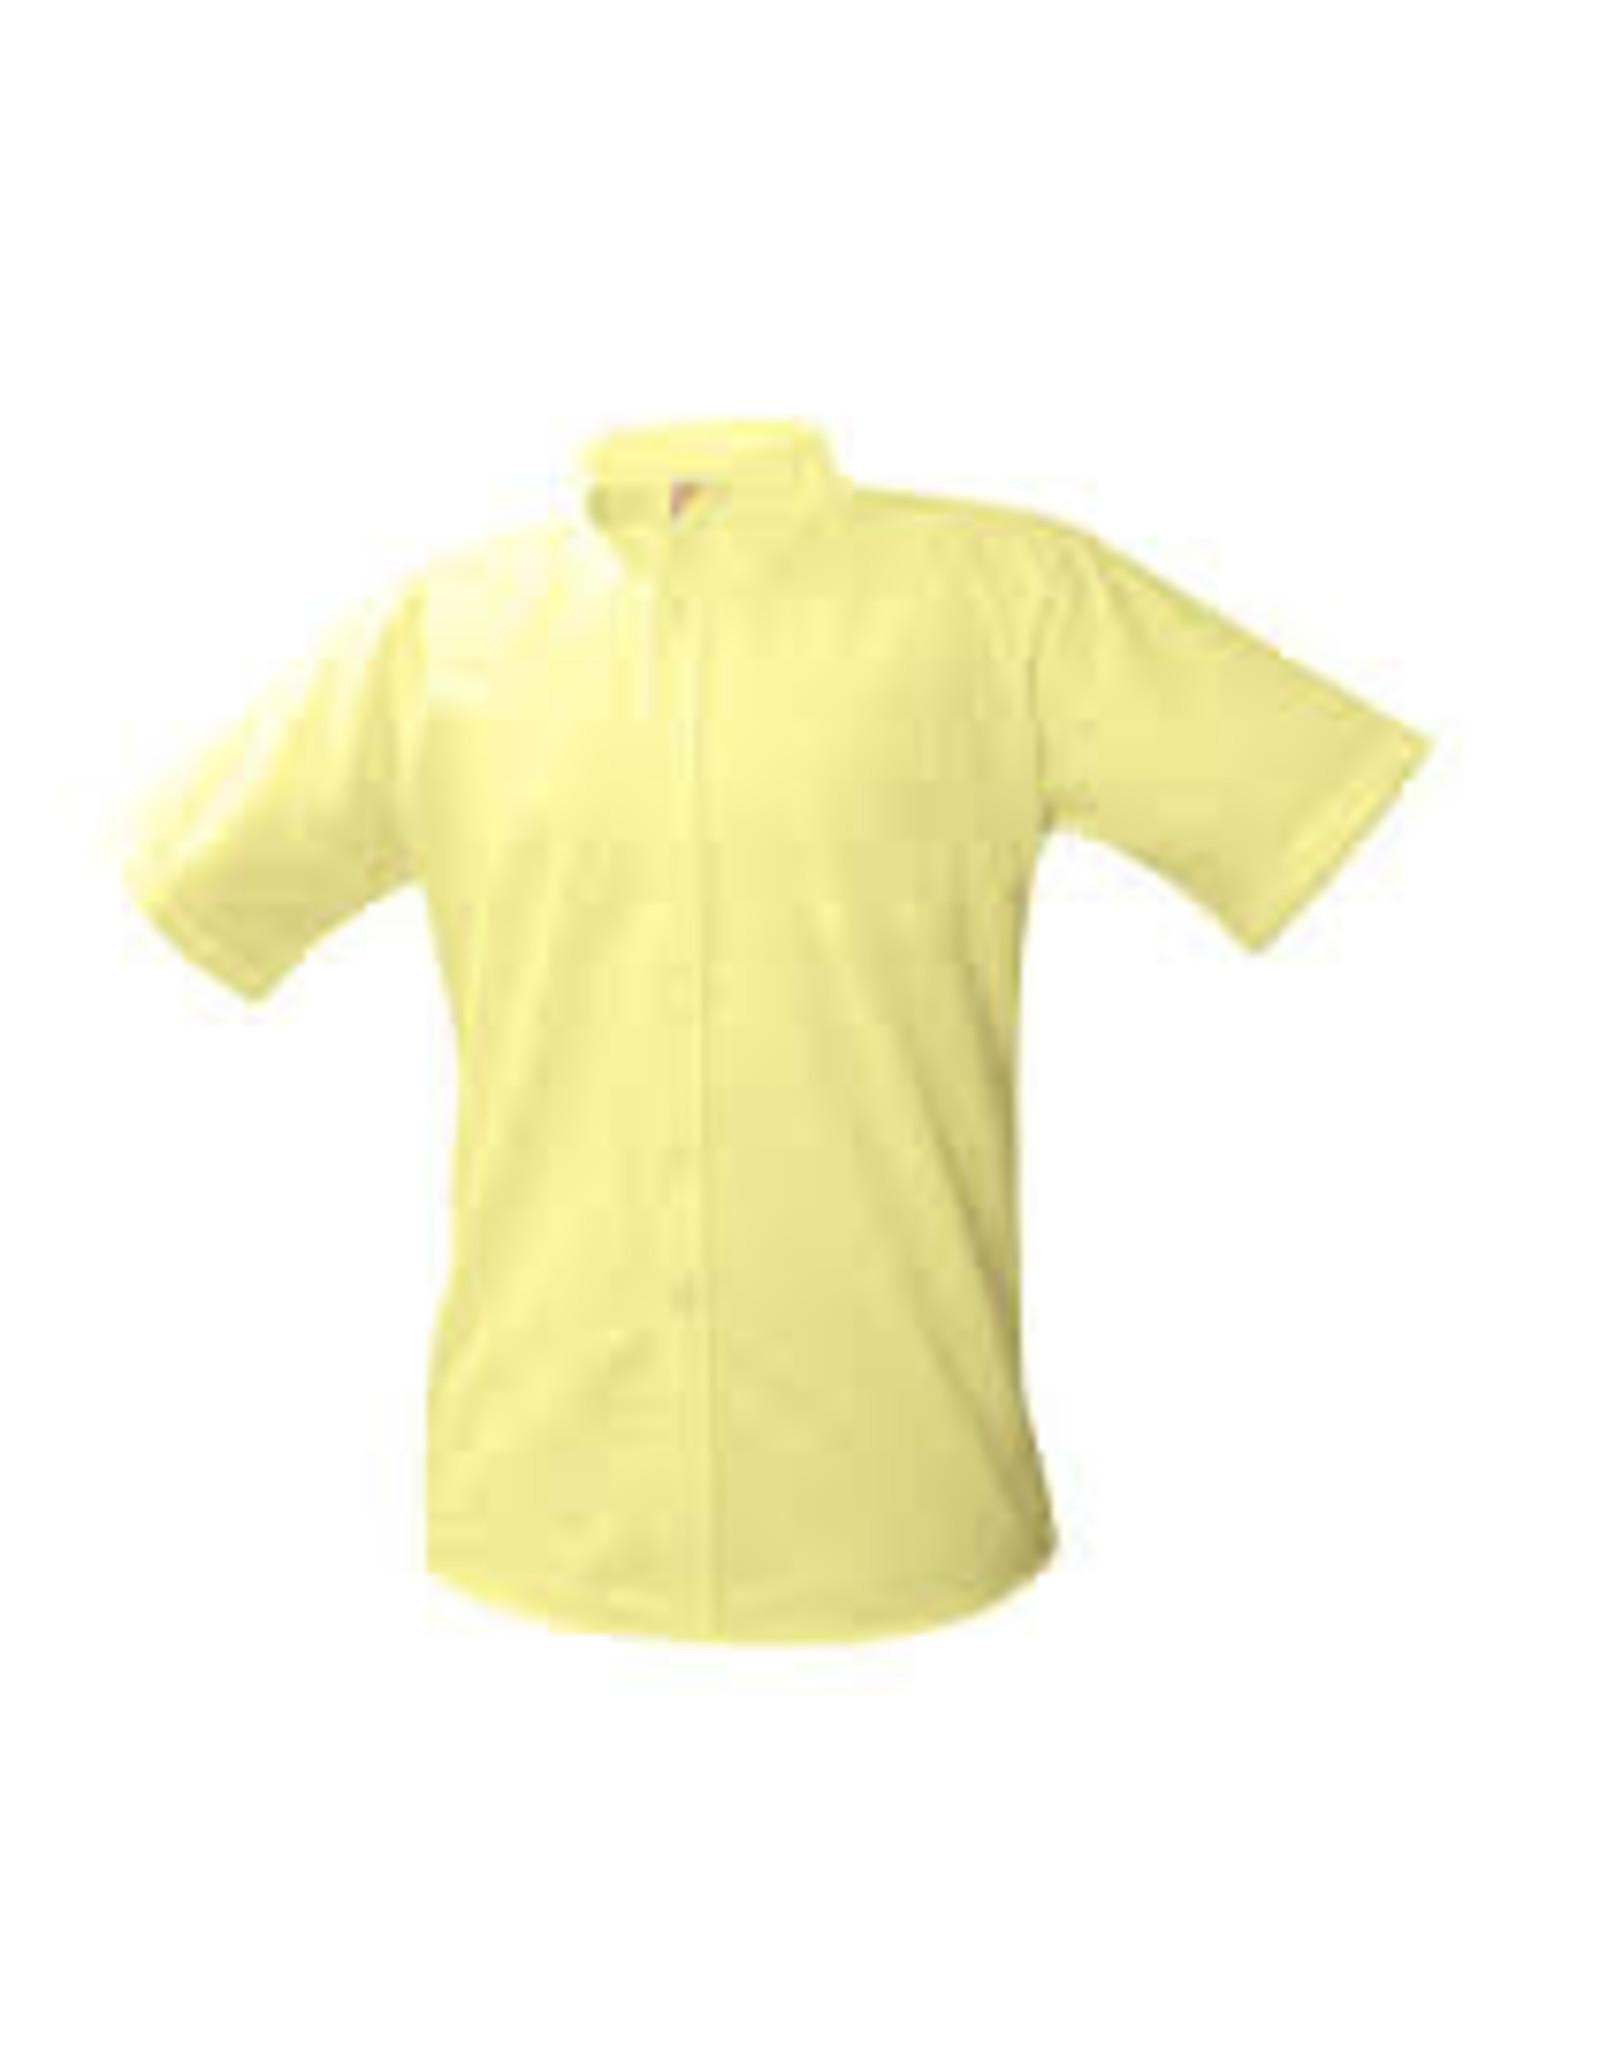 UNIFORM Boys Oxford Short Sleeve, Yellow